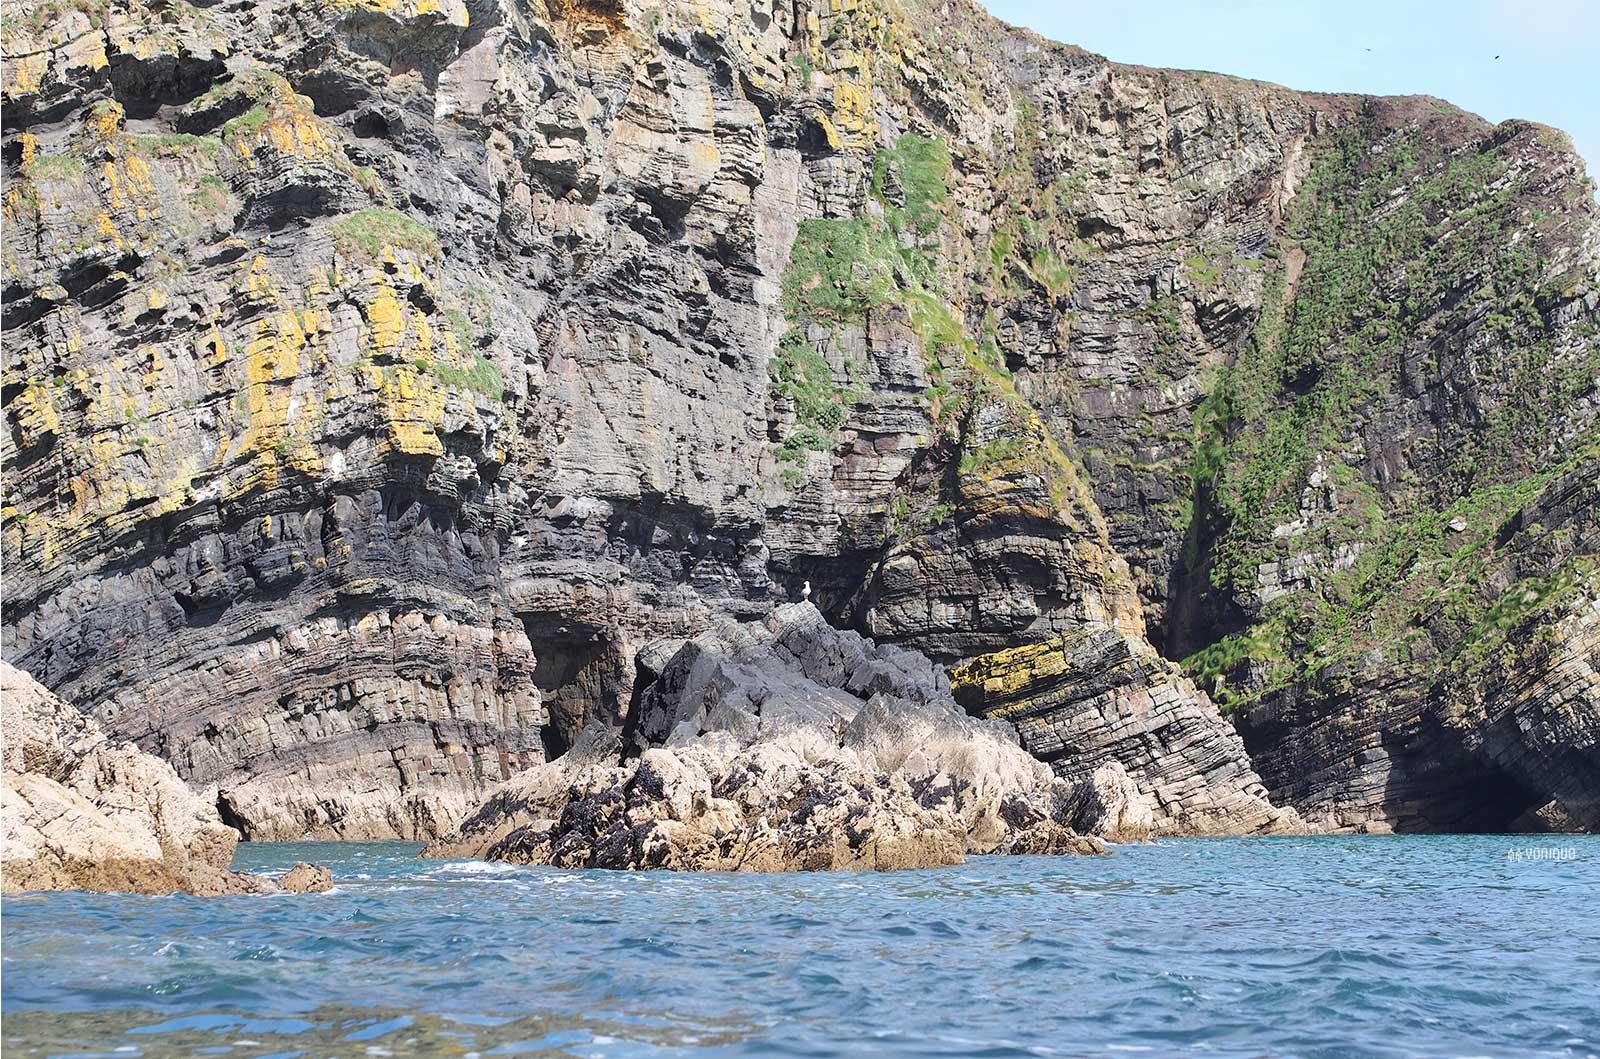 cliffs-nohoval-cove-cork-irelande-falaise-kayak-yoniquenews